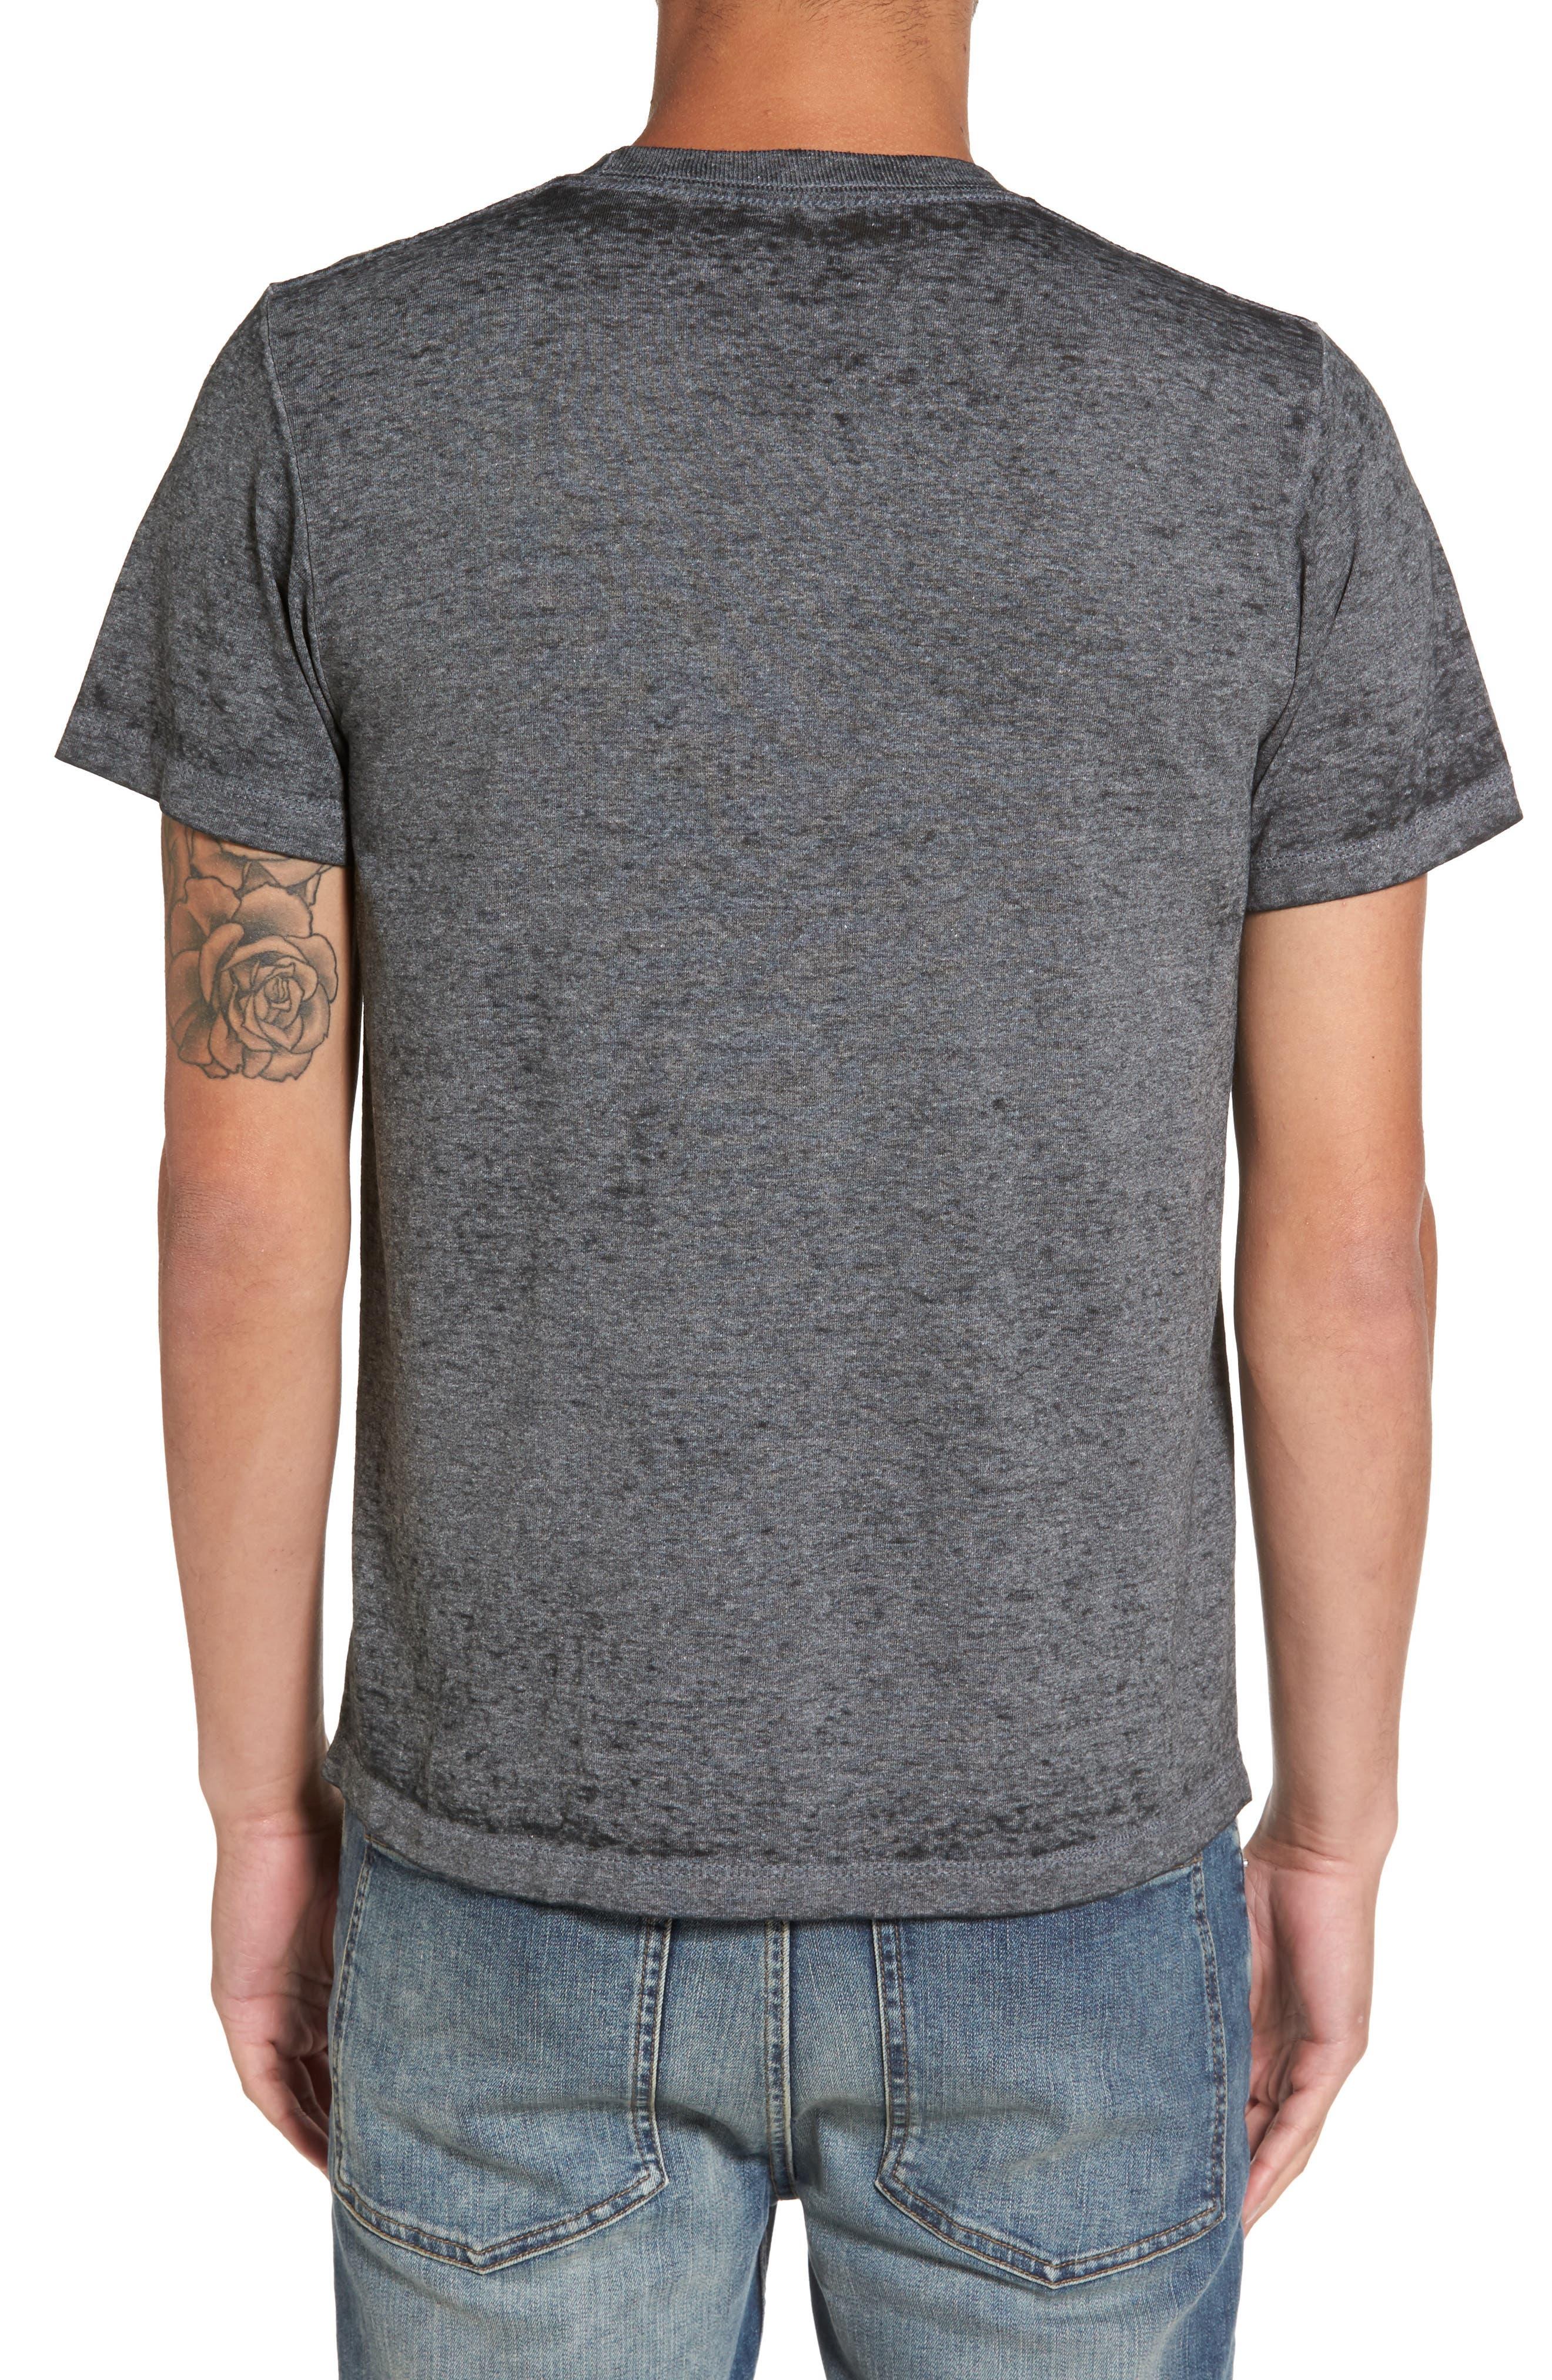 Balance Process T-Shirt,                             Alternate thumbnail 6, color,